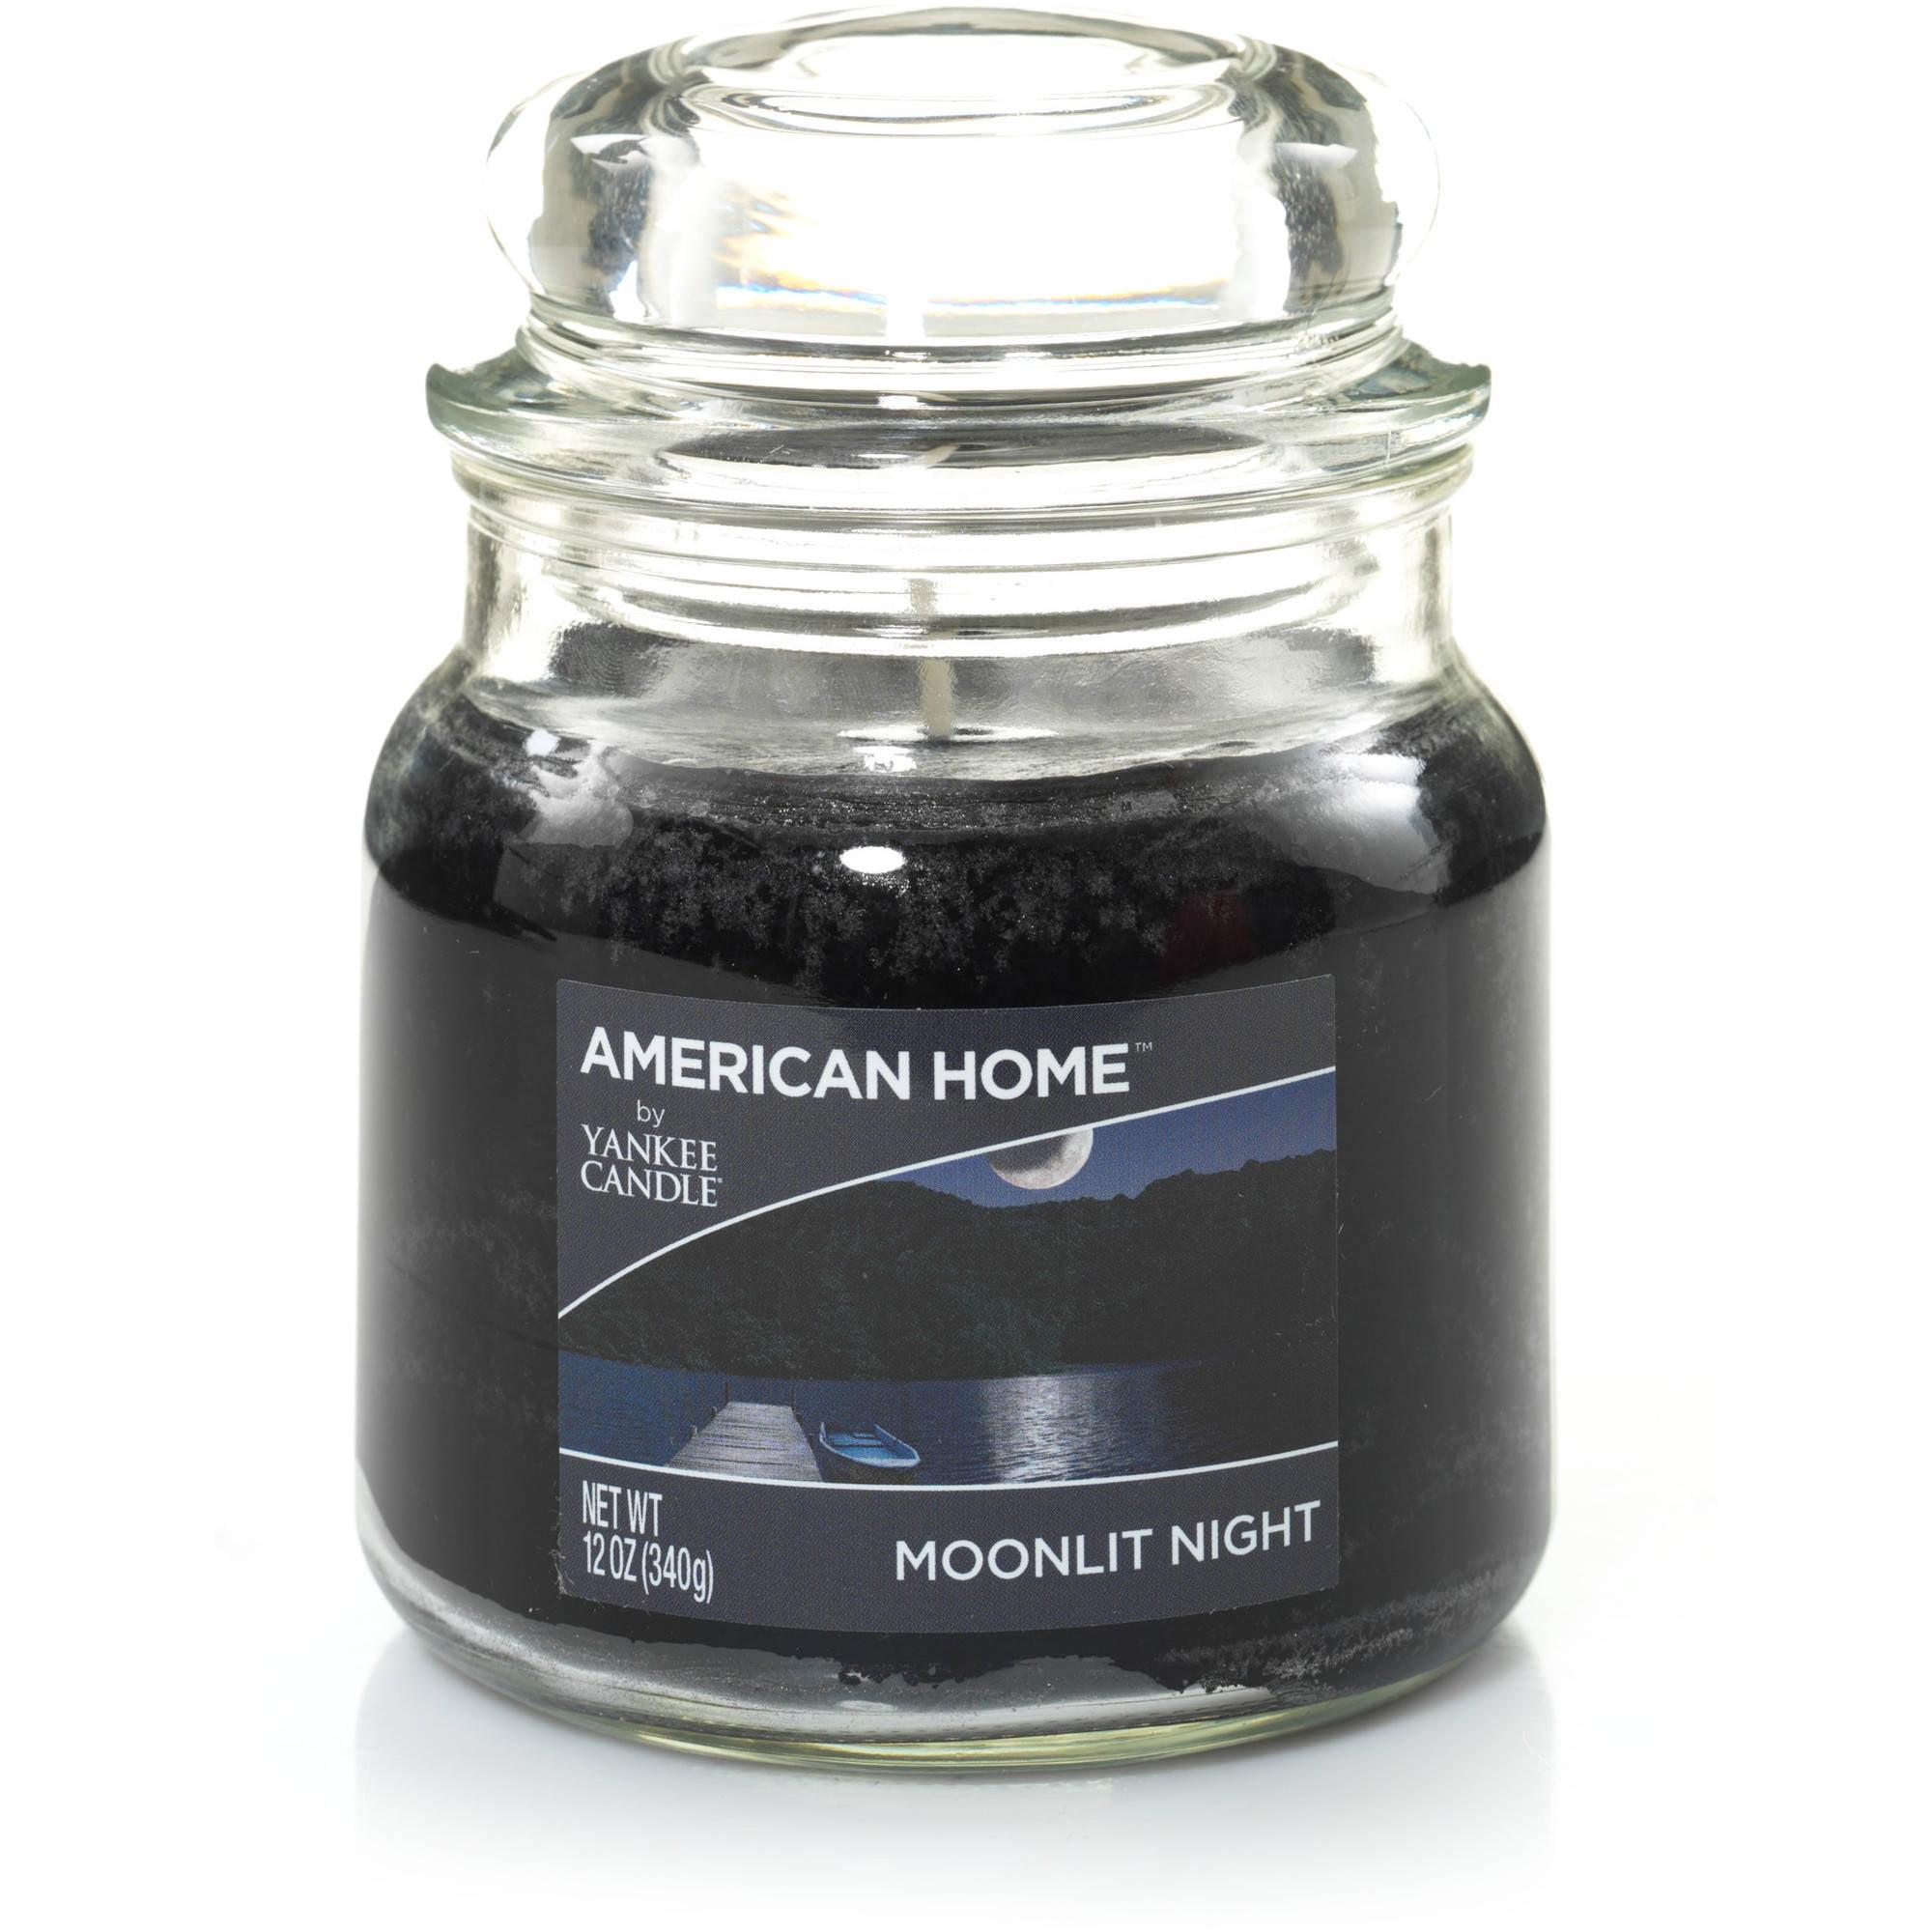 American Home by Yankee Candle Moonlit Night, 12 oz Medium Jar